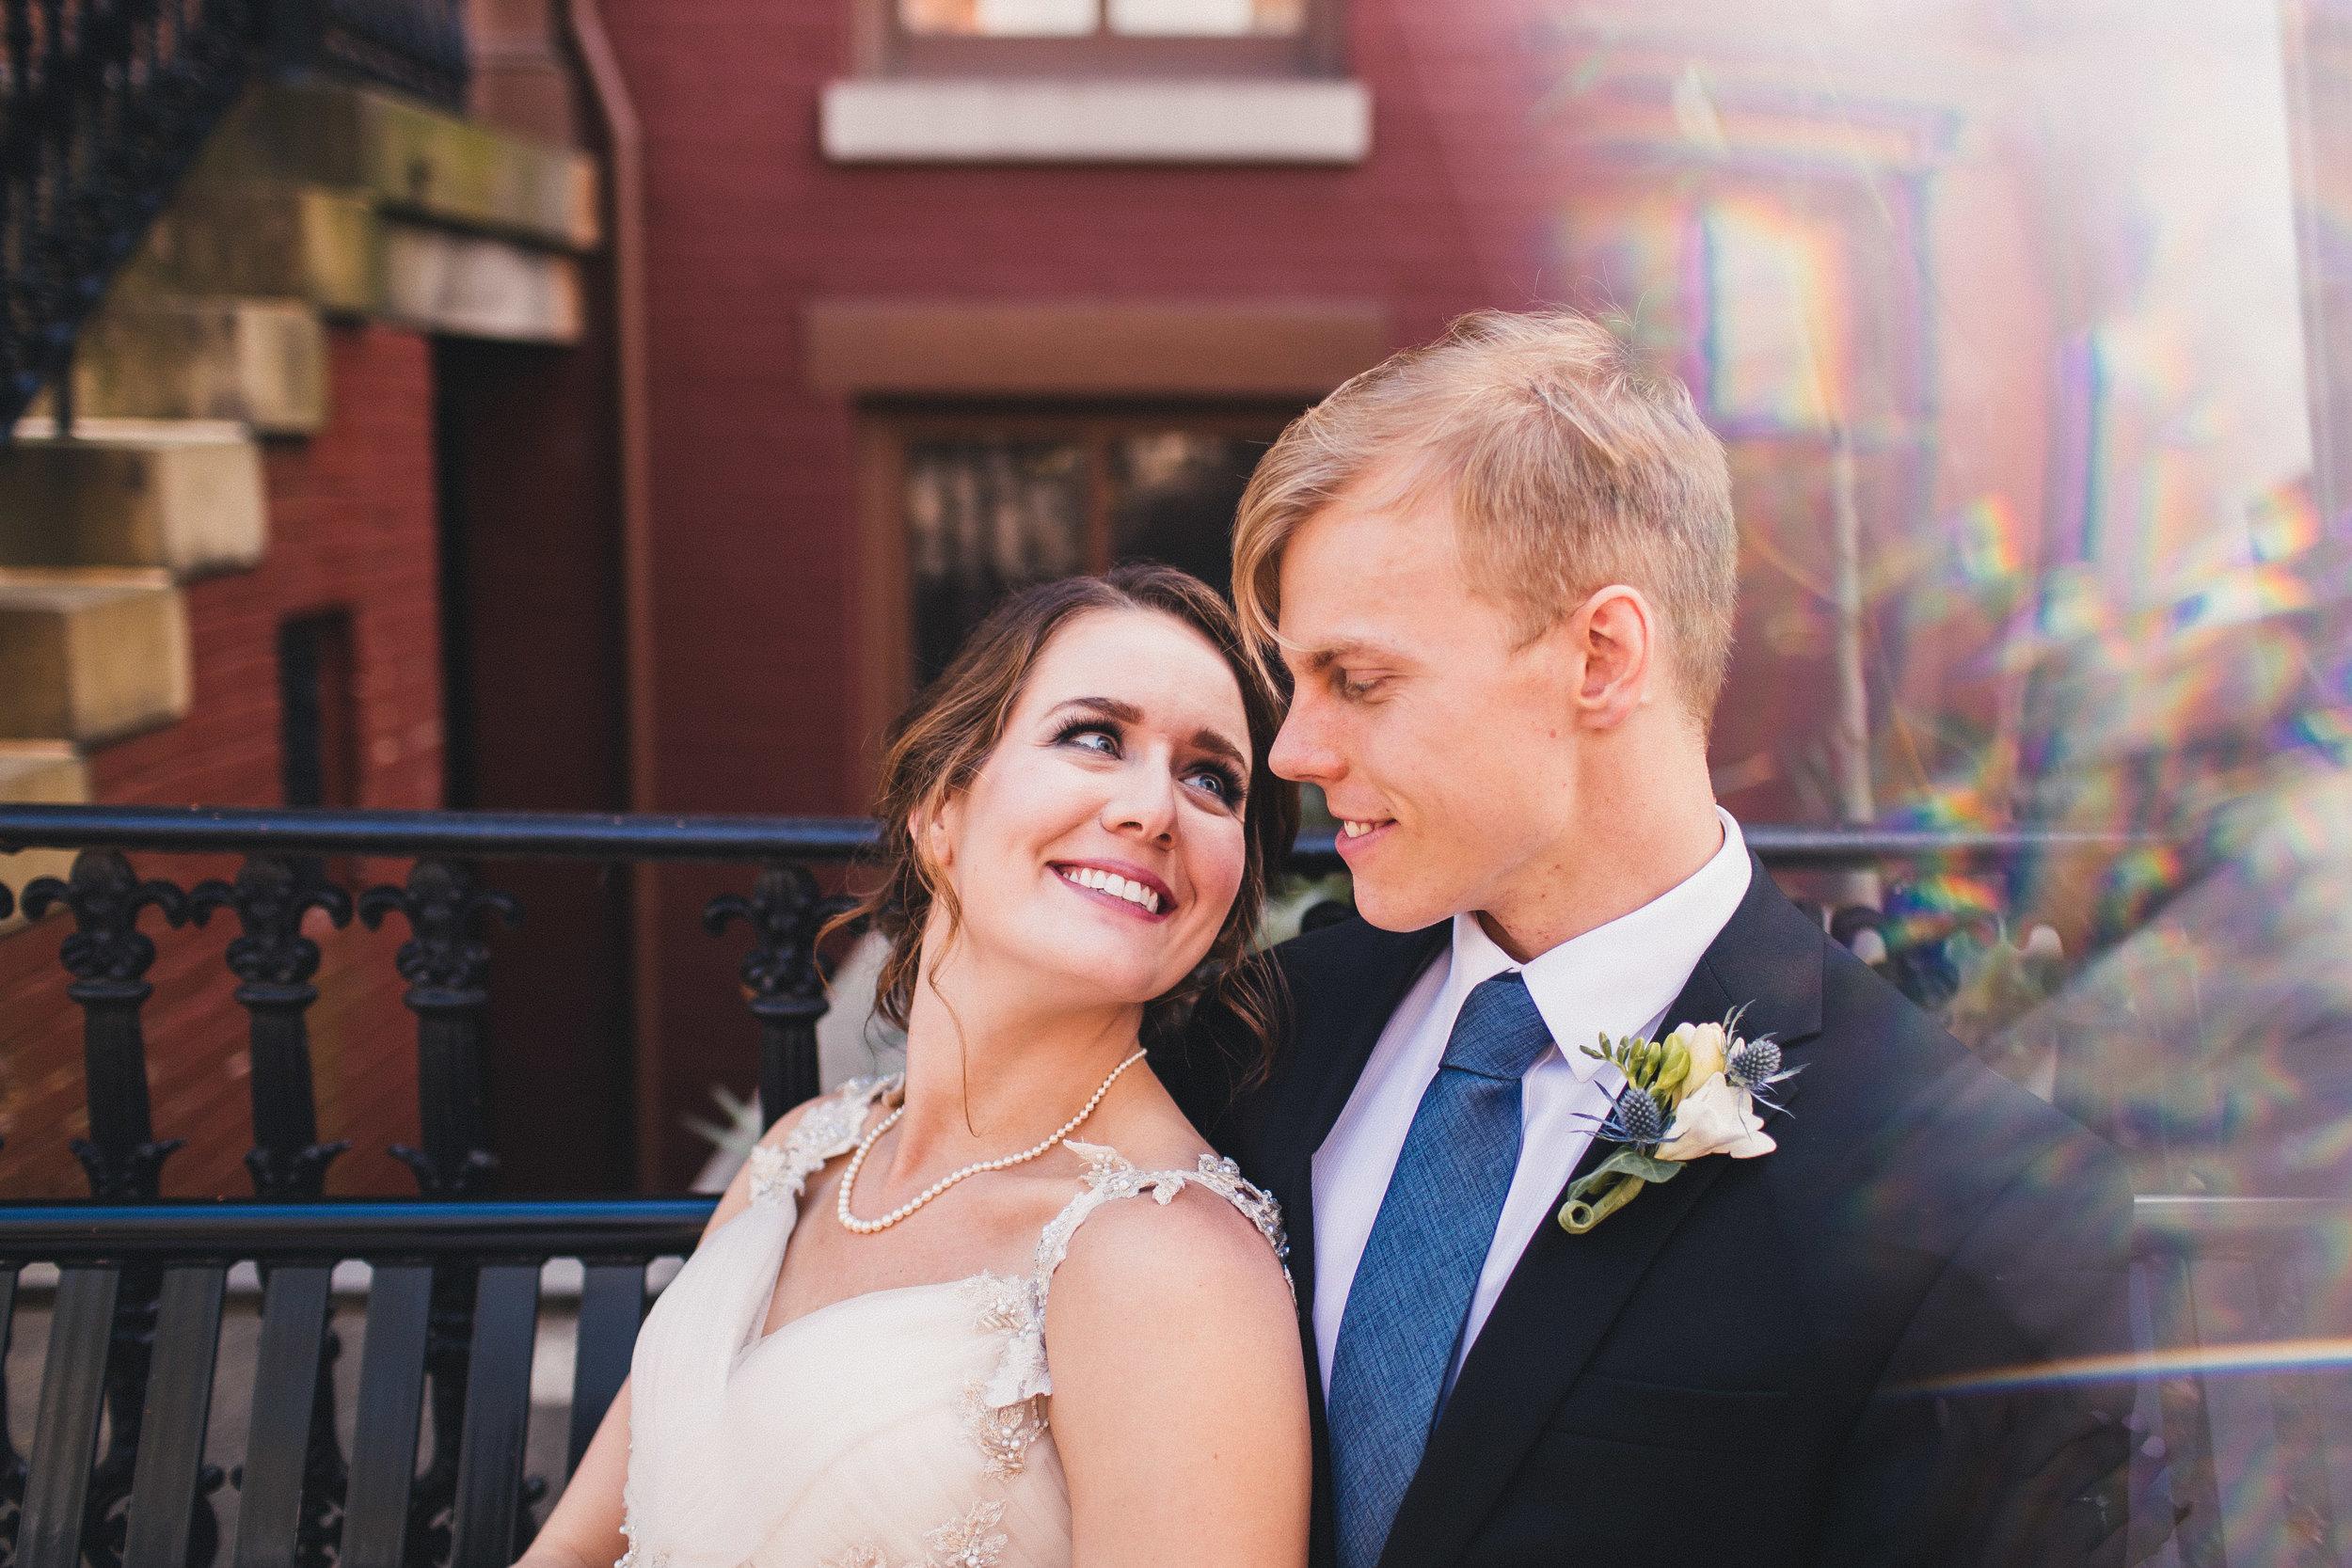 Lindsey & Bert - Wedding 4.1.17-359.jpg